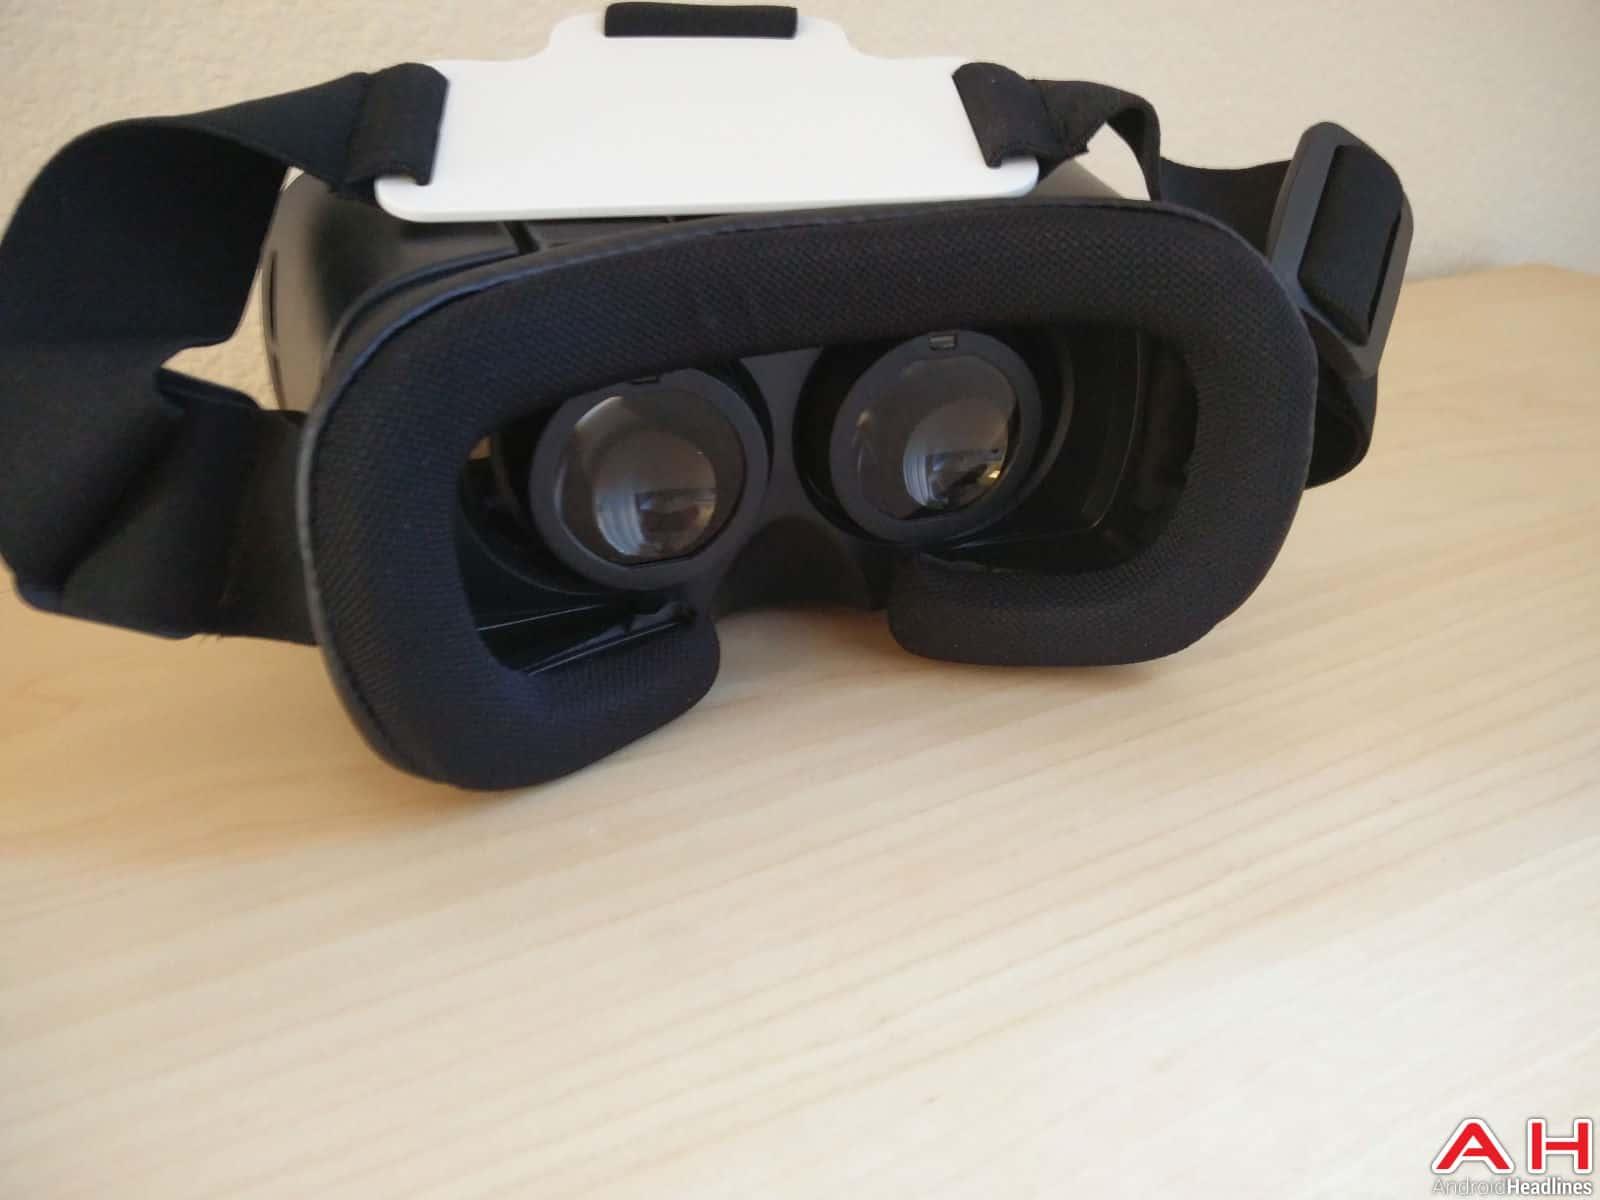 INNORI Virtual Reality Headset-16